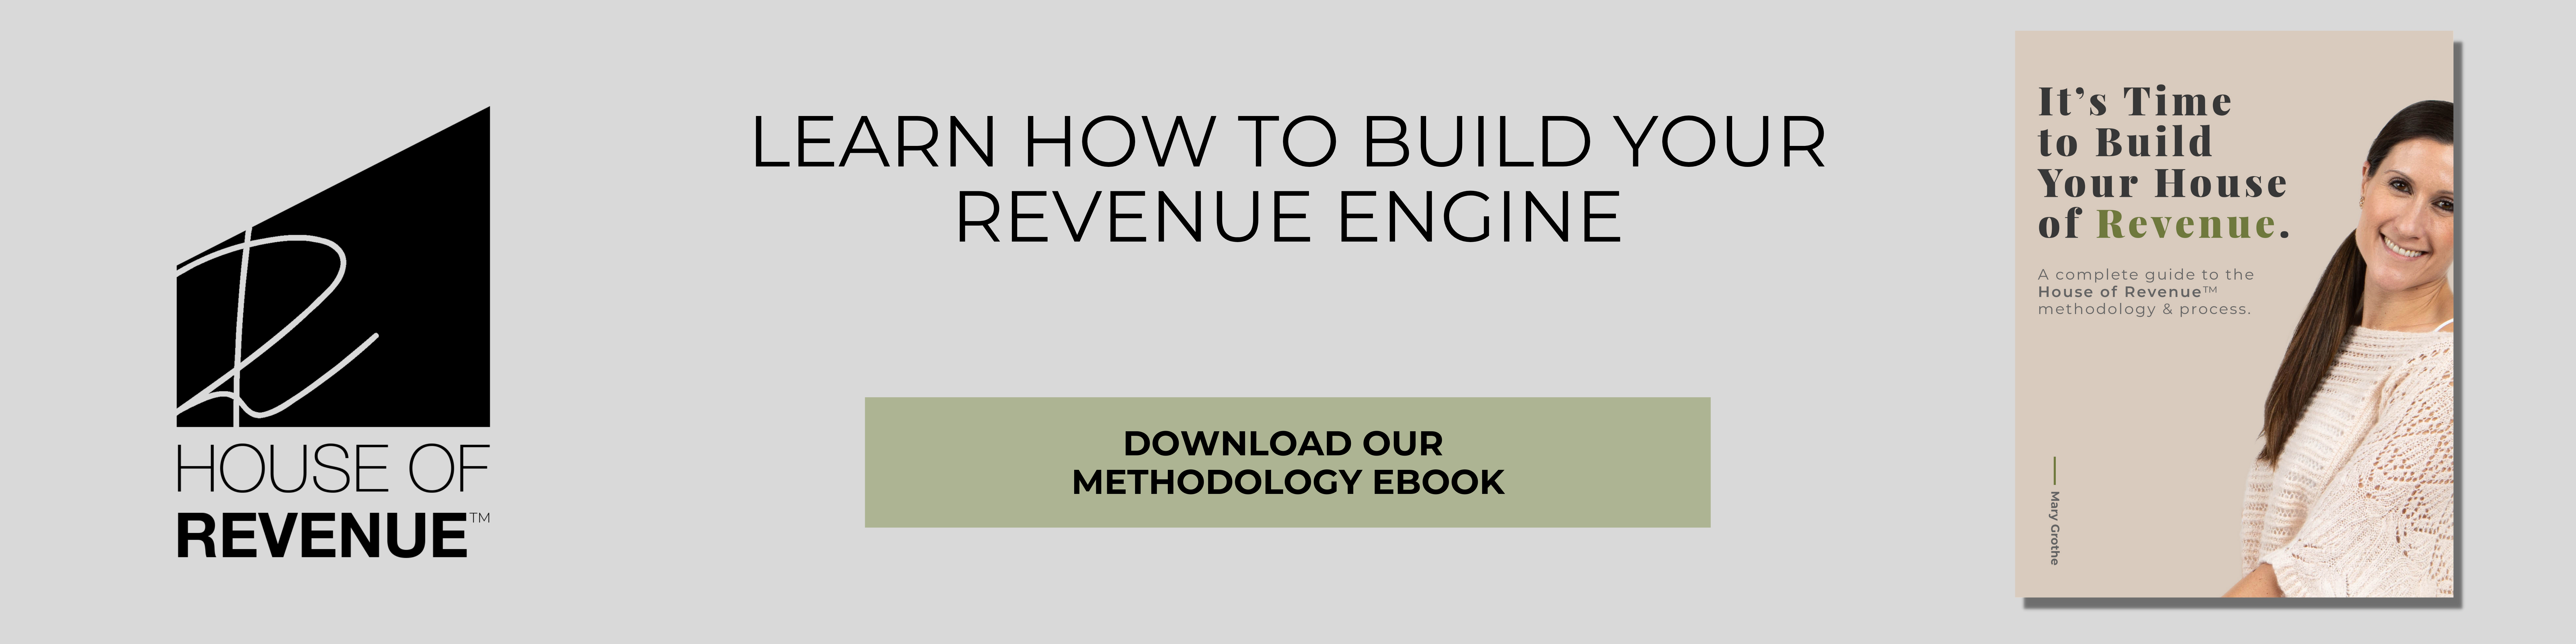 Methodology eBook CTA Banner